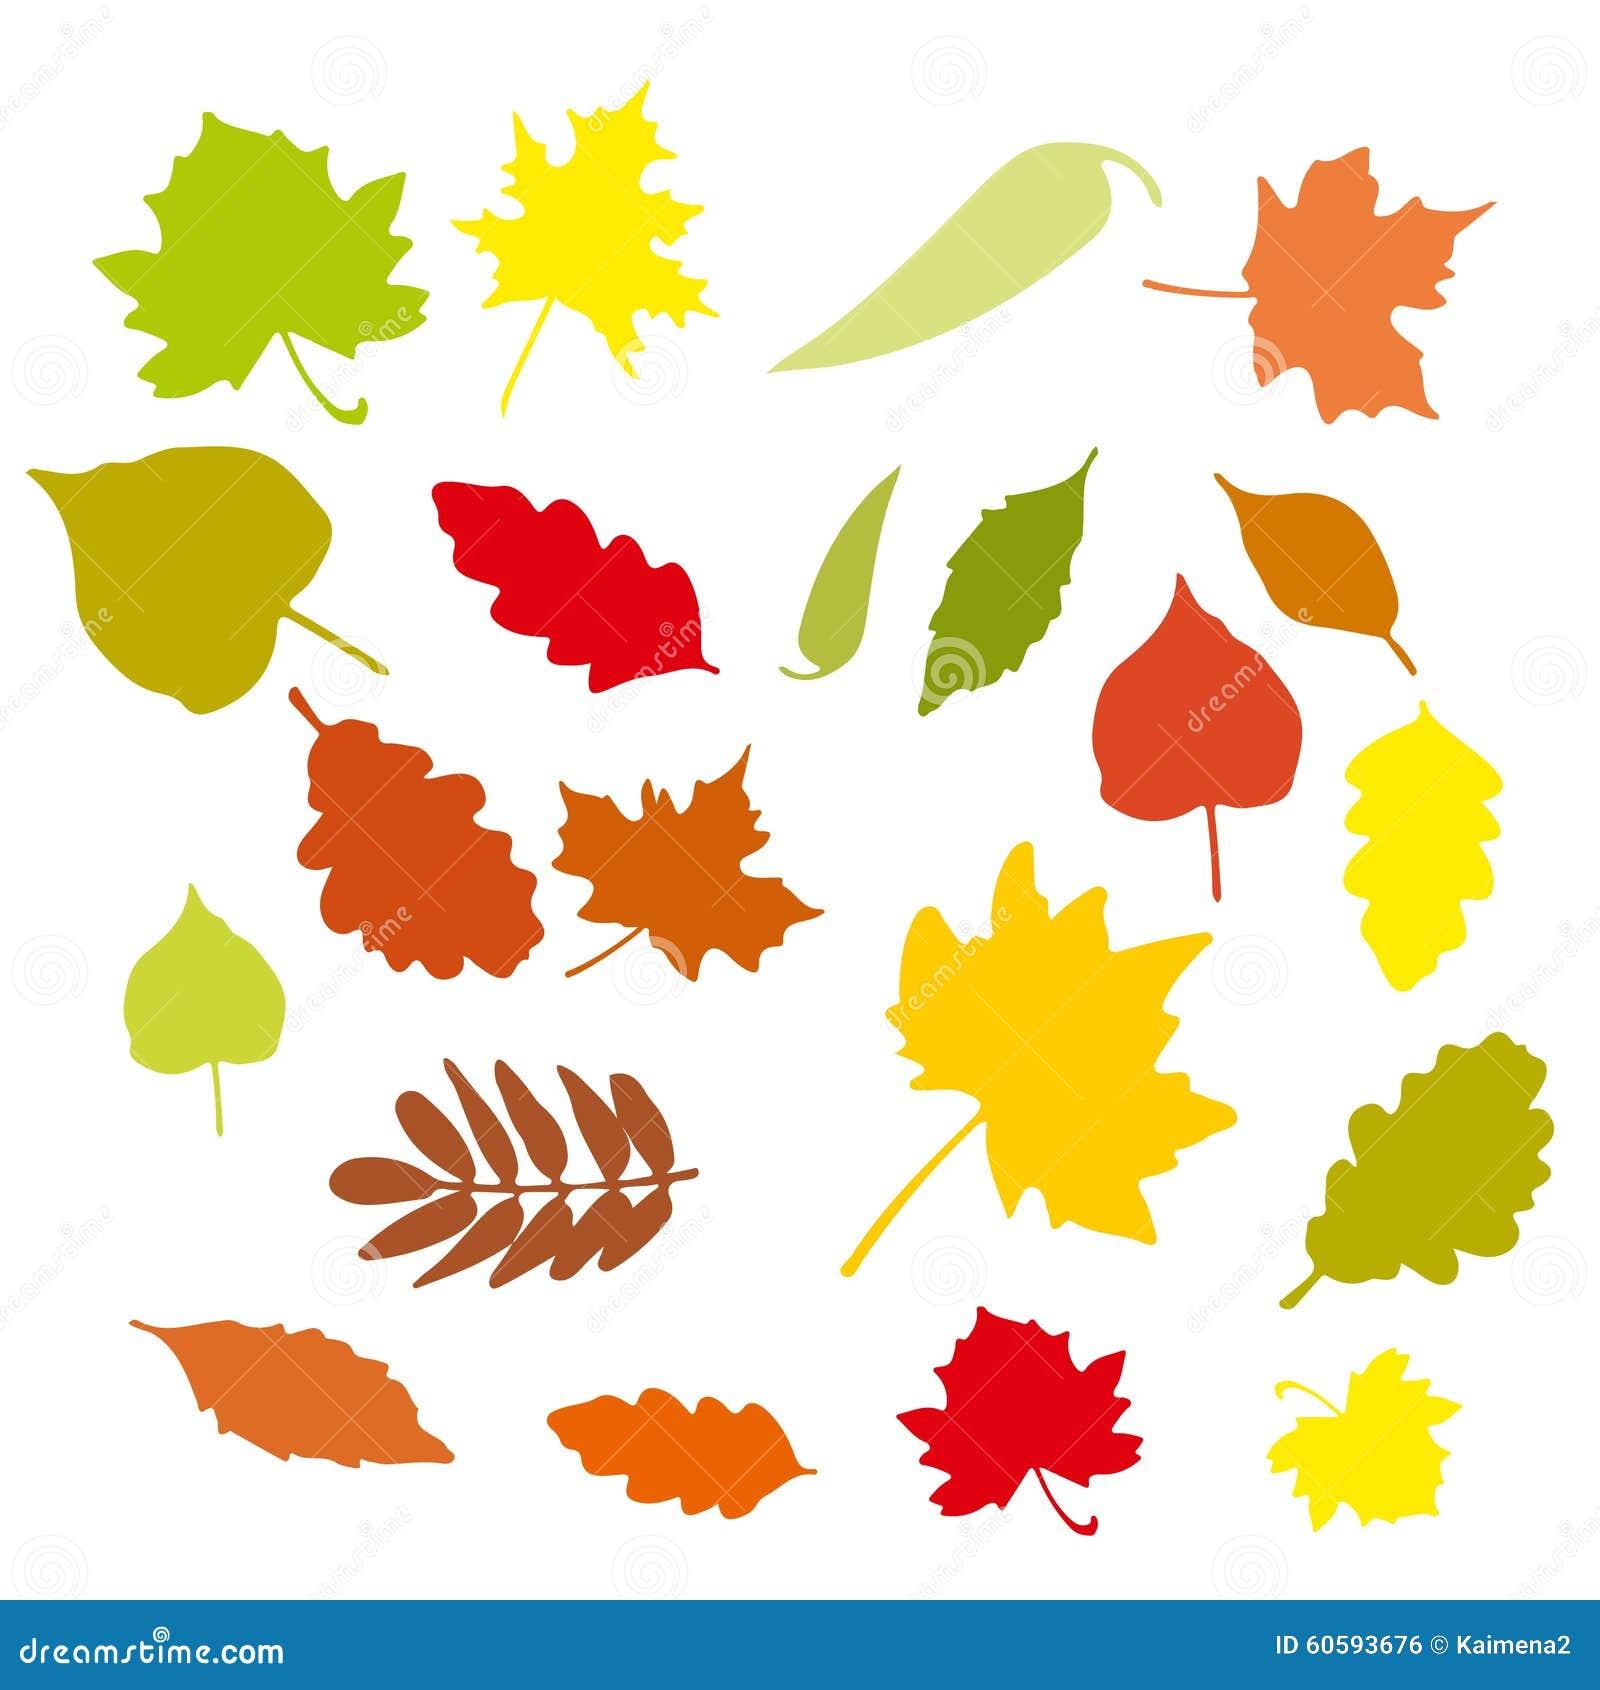 Set Of Colorful Cartoon Autumn Leaves. Vector Illustration